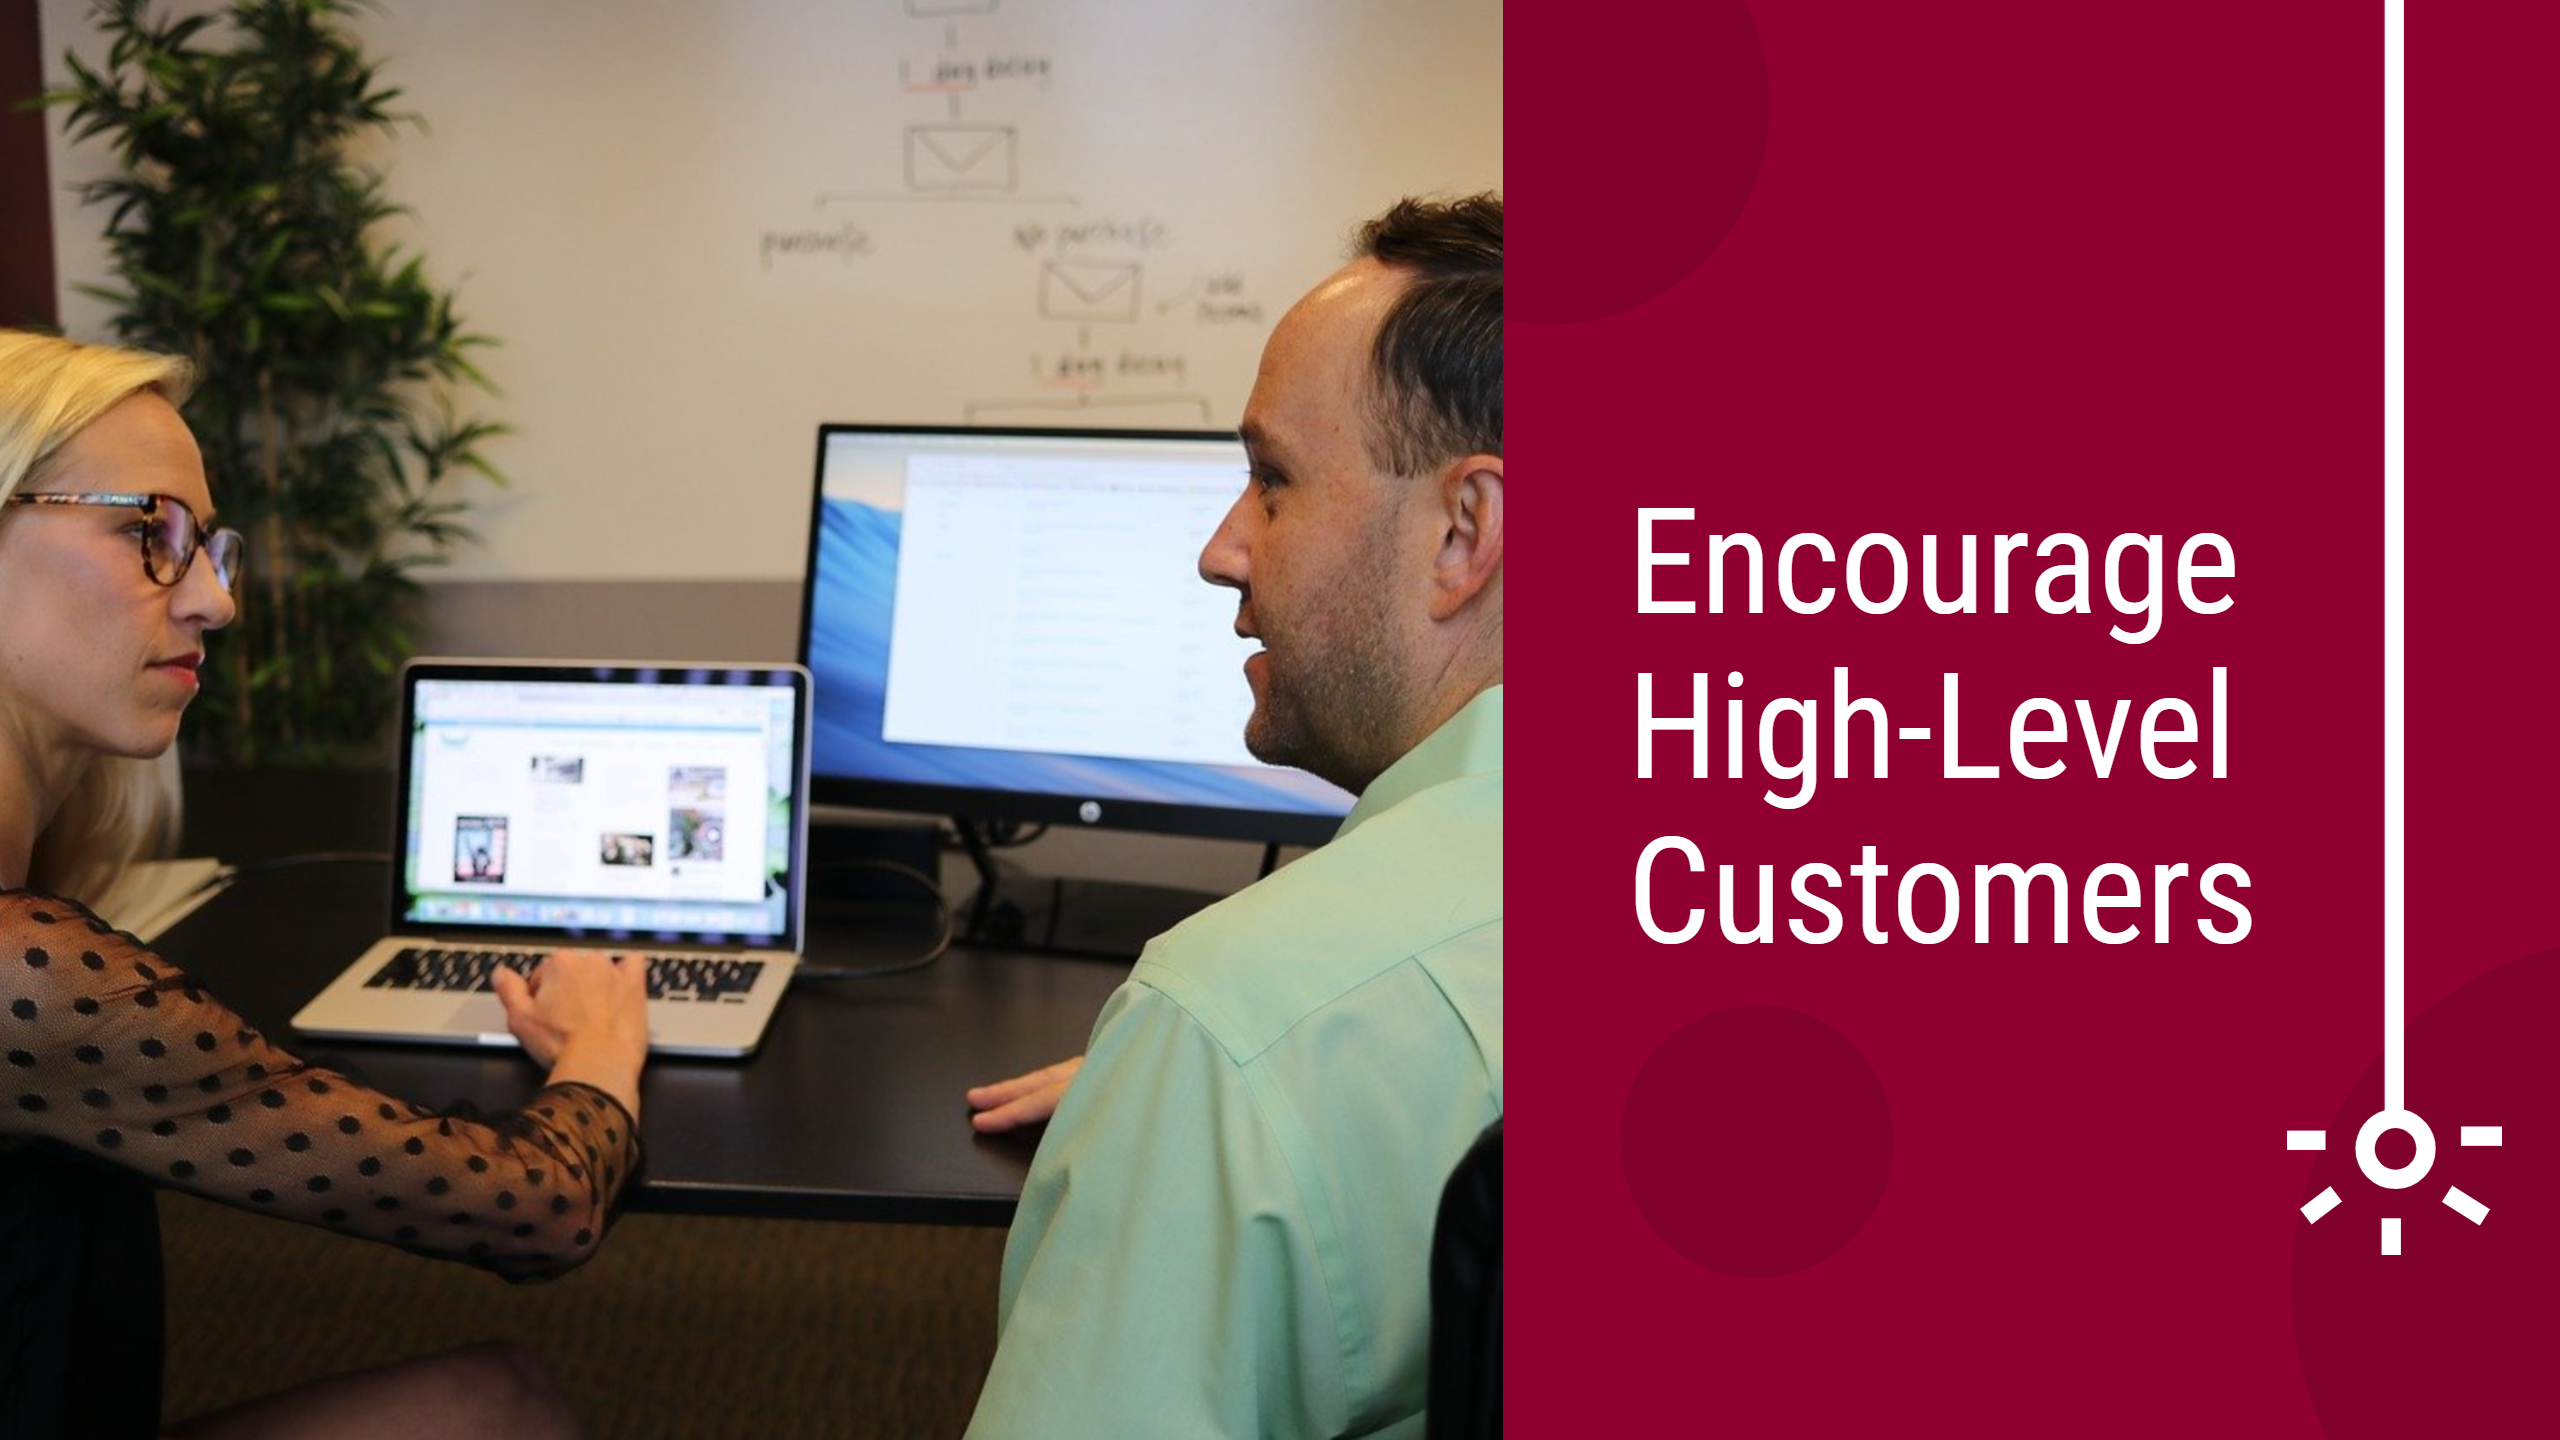 Encourage High-Level Customers